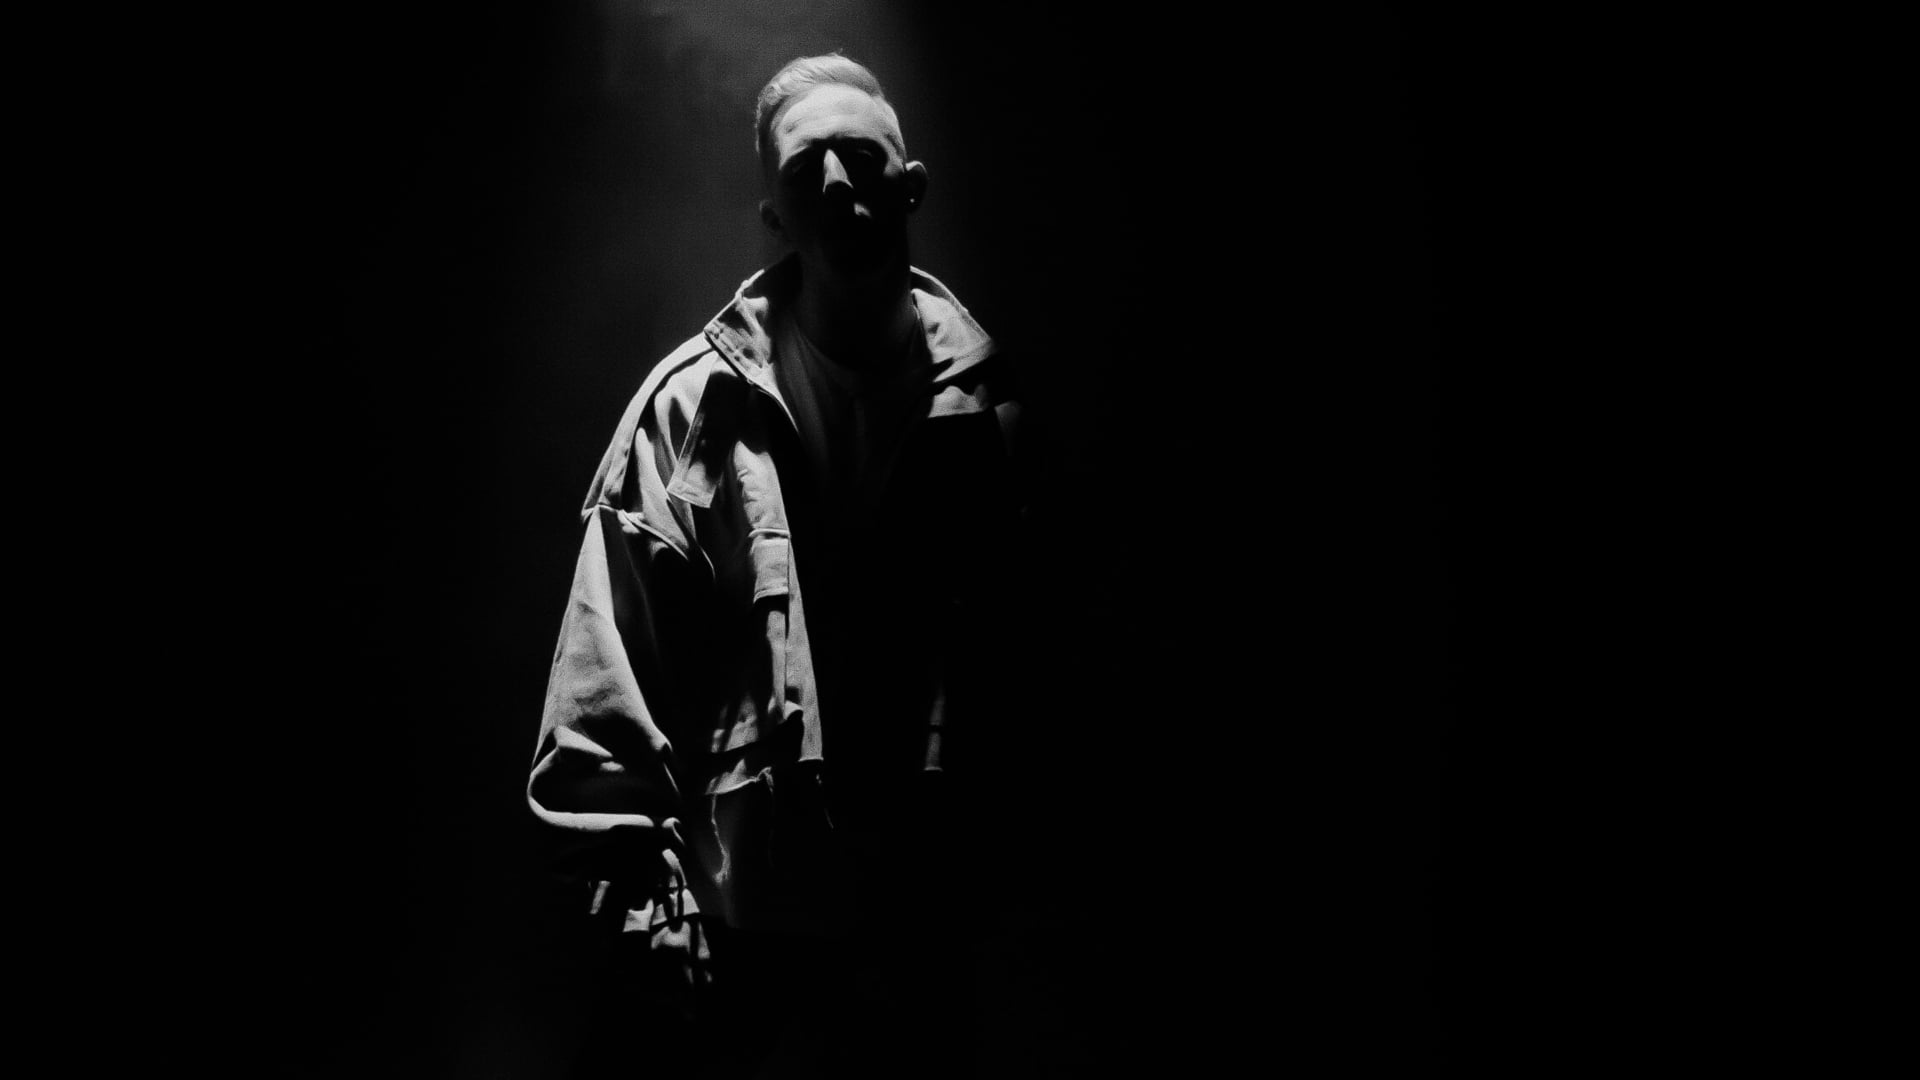 Basha - @ me (Music Video)